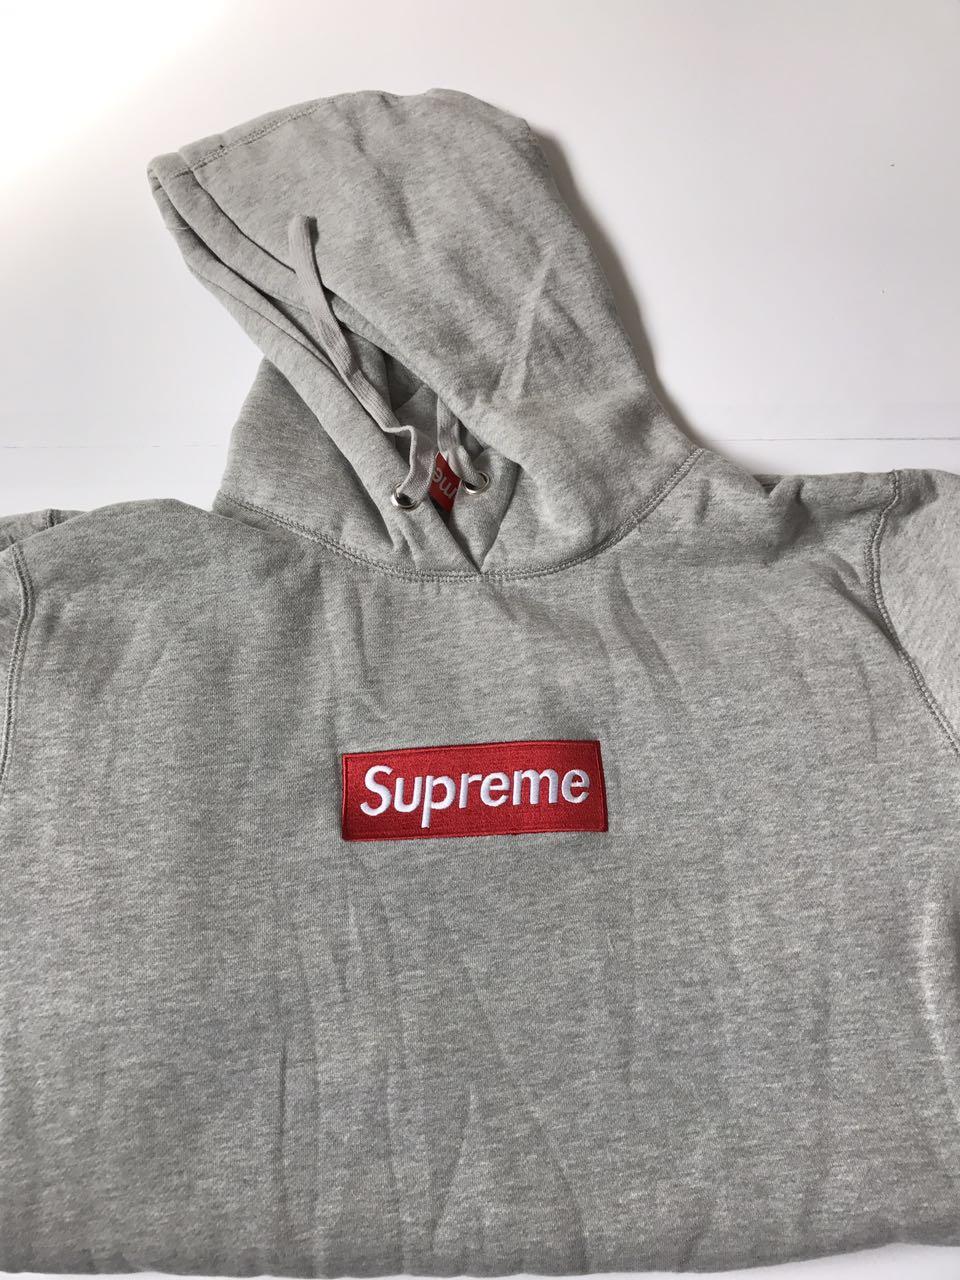 0a0ceebea6aa Supreme Box Logo Hoodie Grey UA Replica on Storenvy